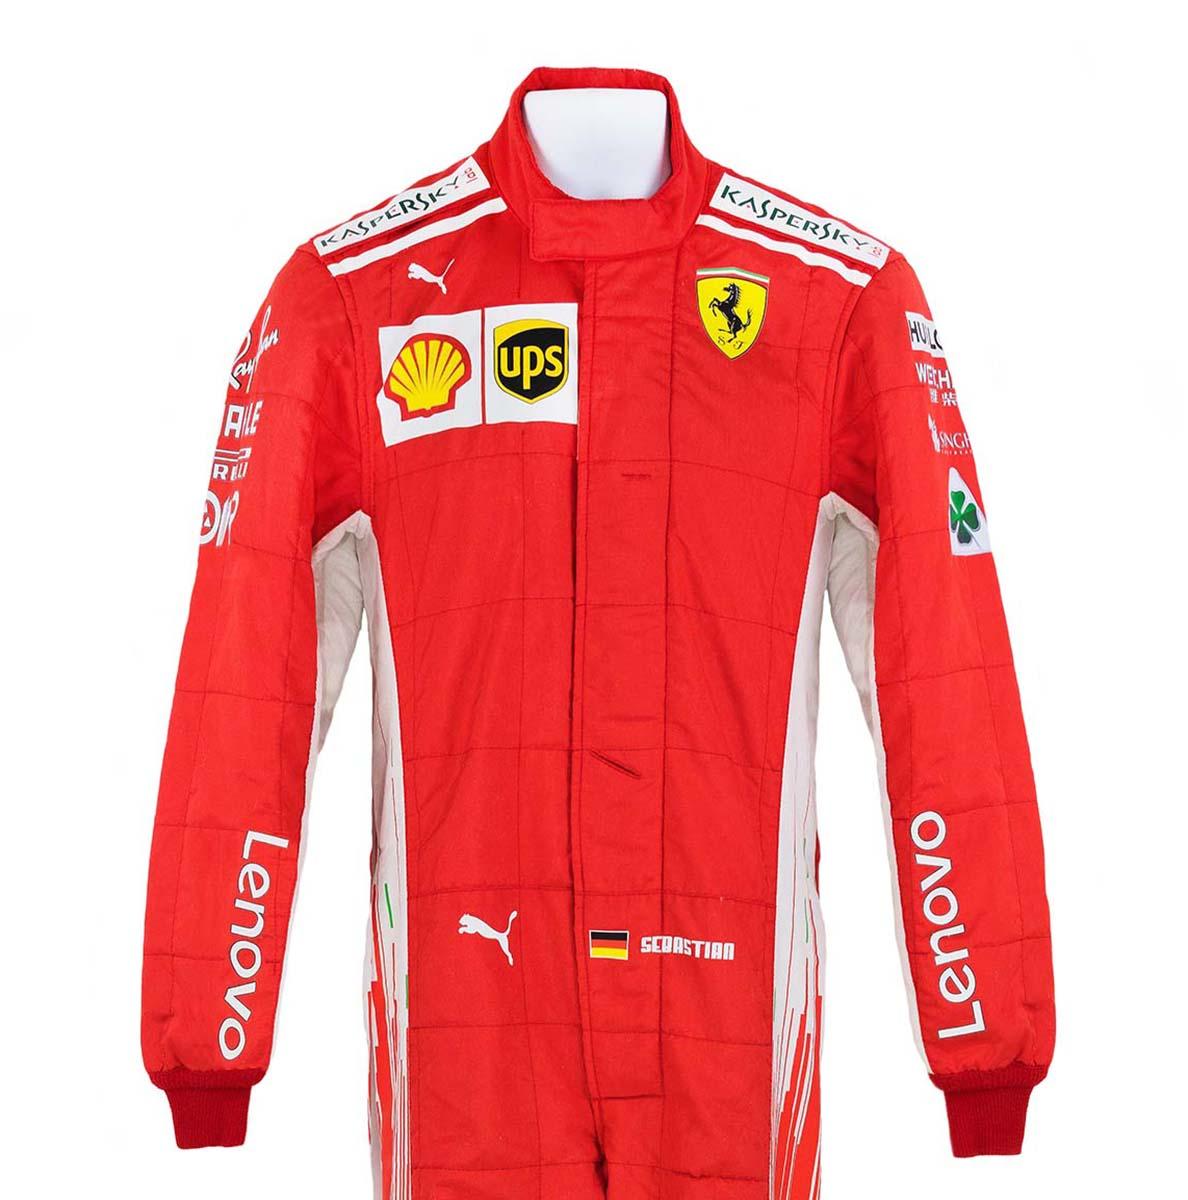 2018 Sebastian Vettel Race Worn Scuderia Ferrari F1 Suit Racing Hall Of Fame Collection